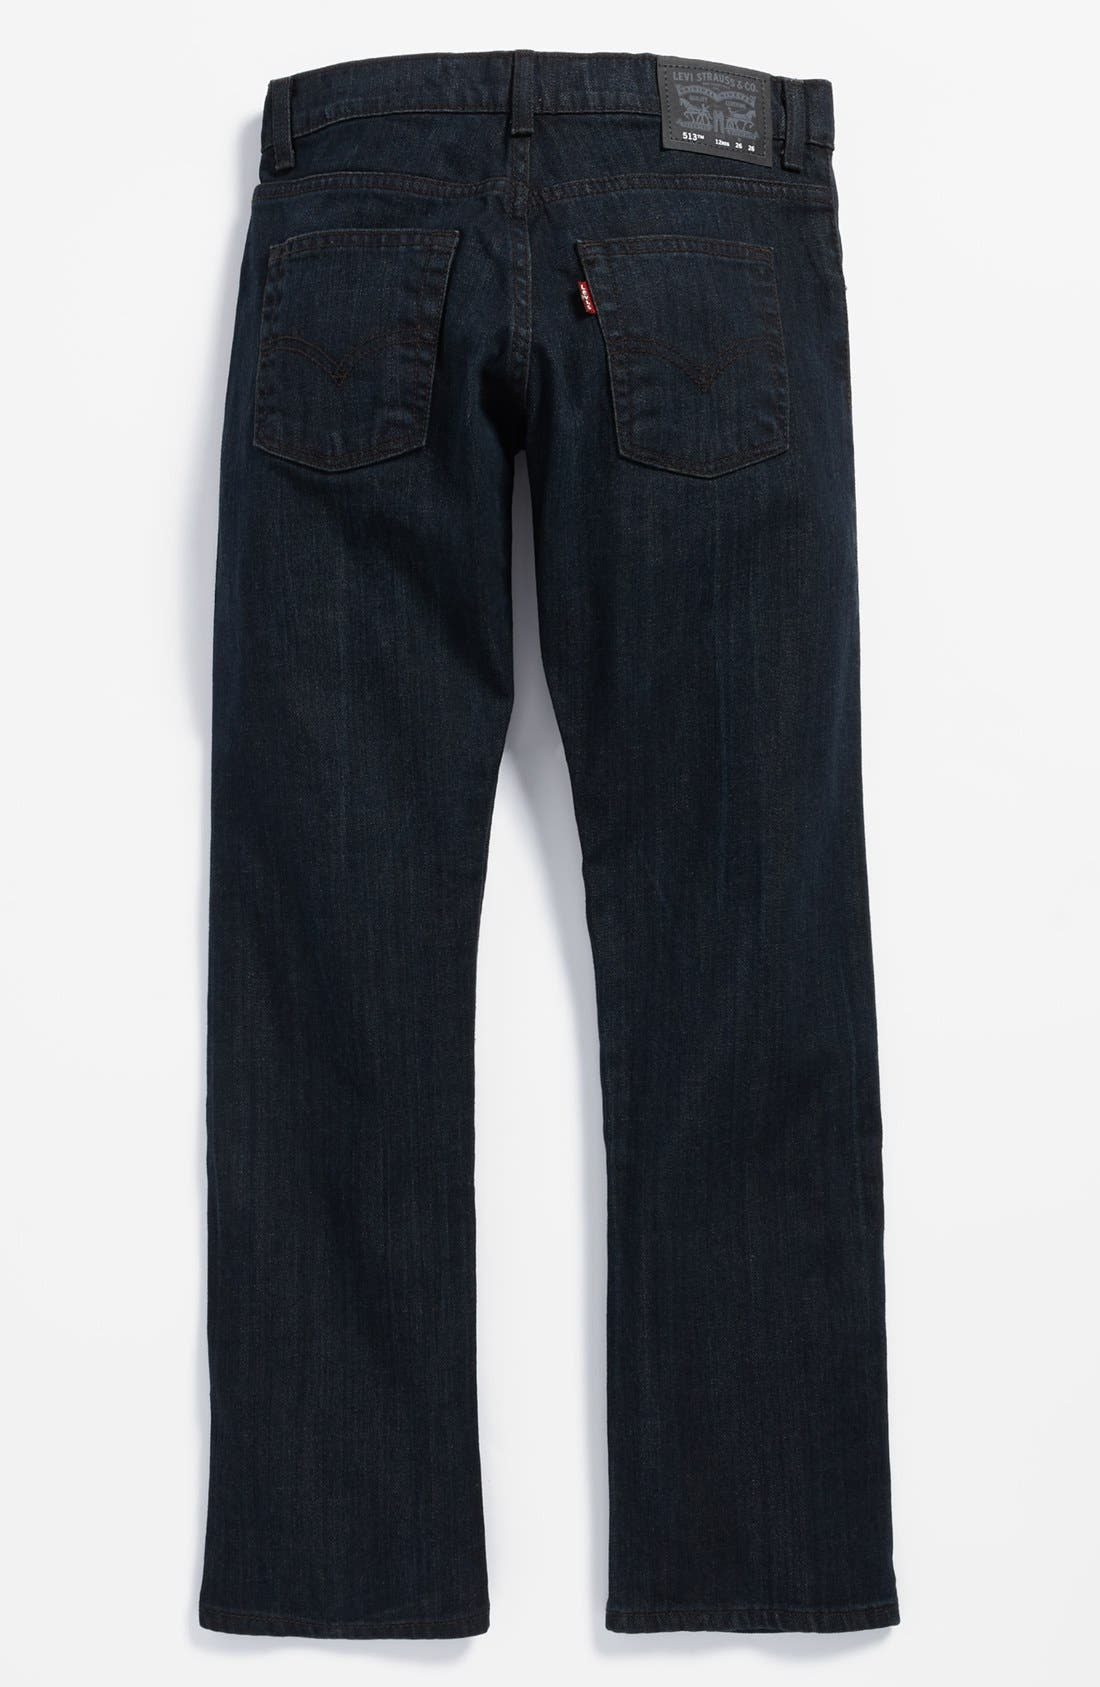 Alternate Image 1 Selected - Levi's® '513™' Slim Straight Leg Jeans (Big Boys)